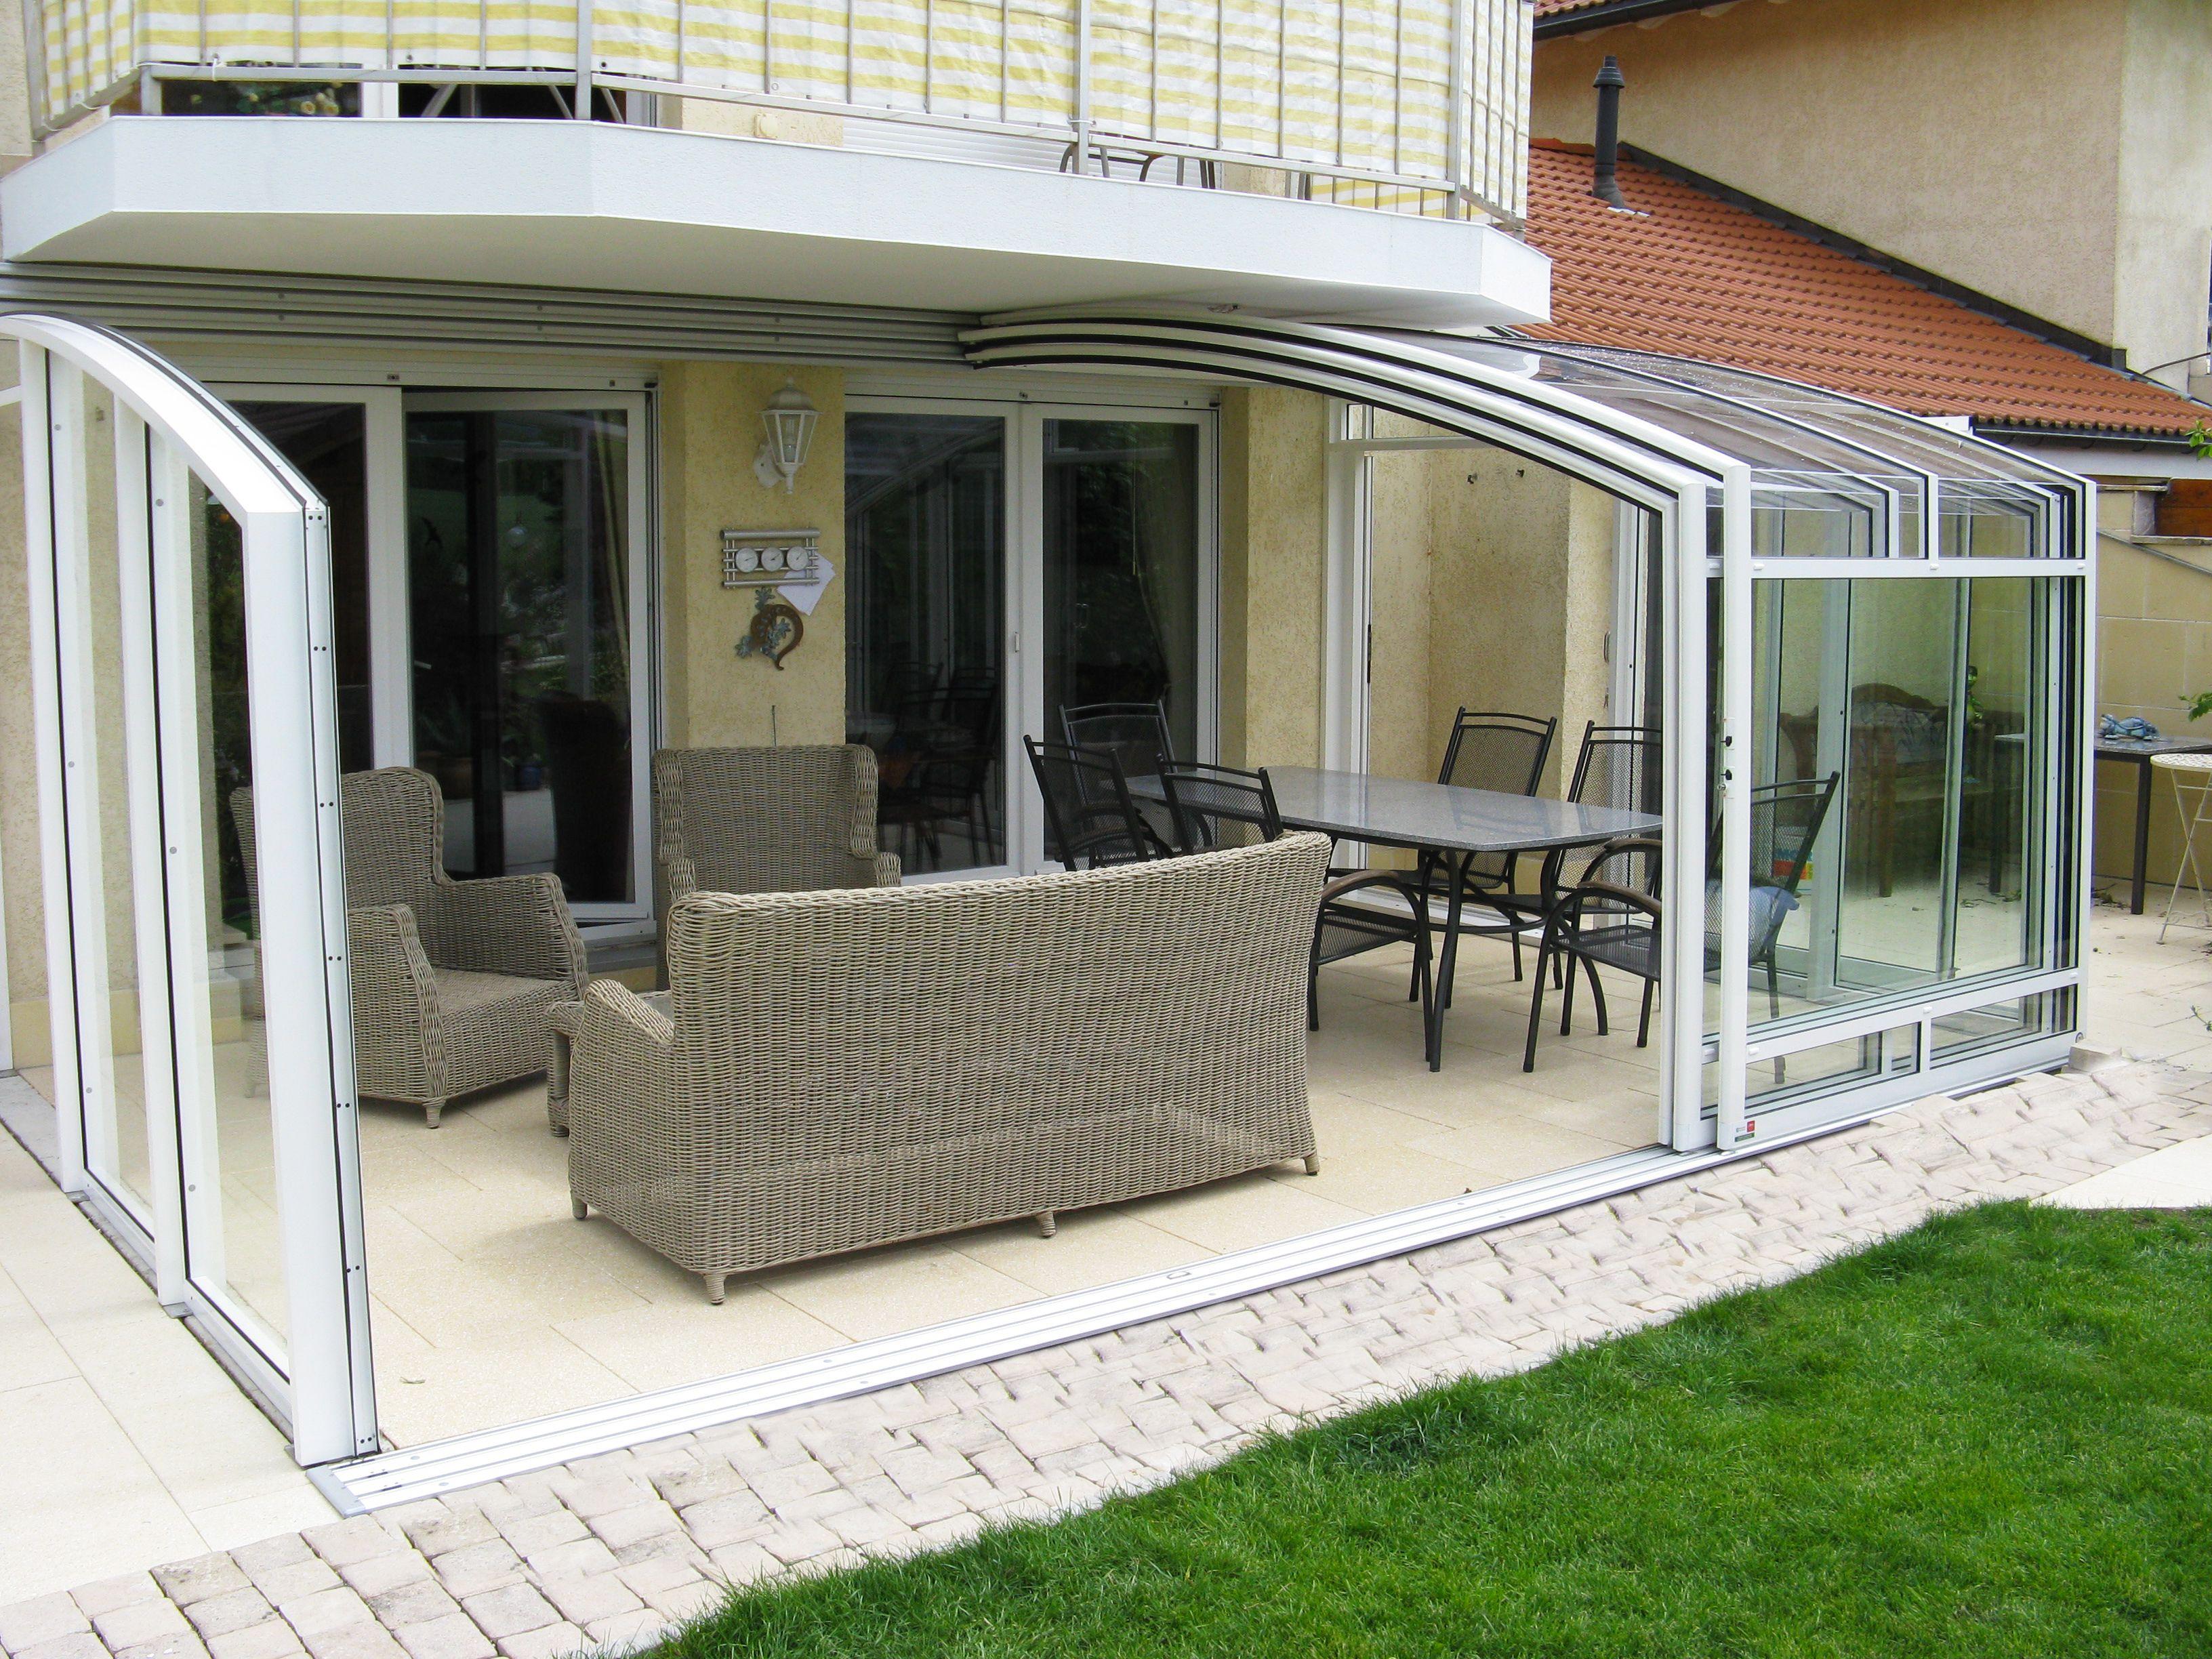 Retractable Patio Enclosure For Your Home